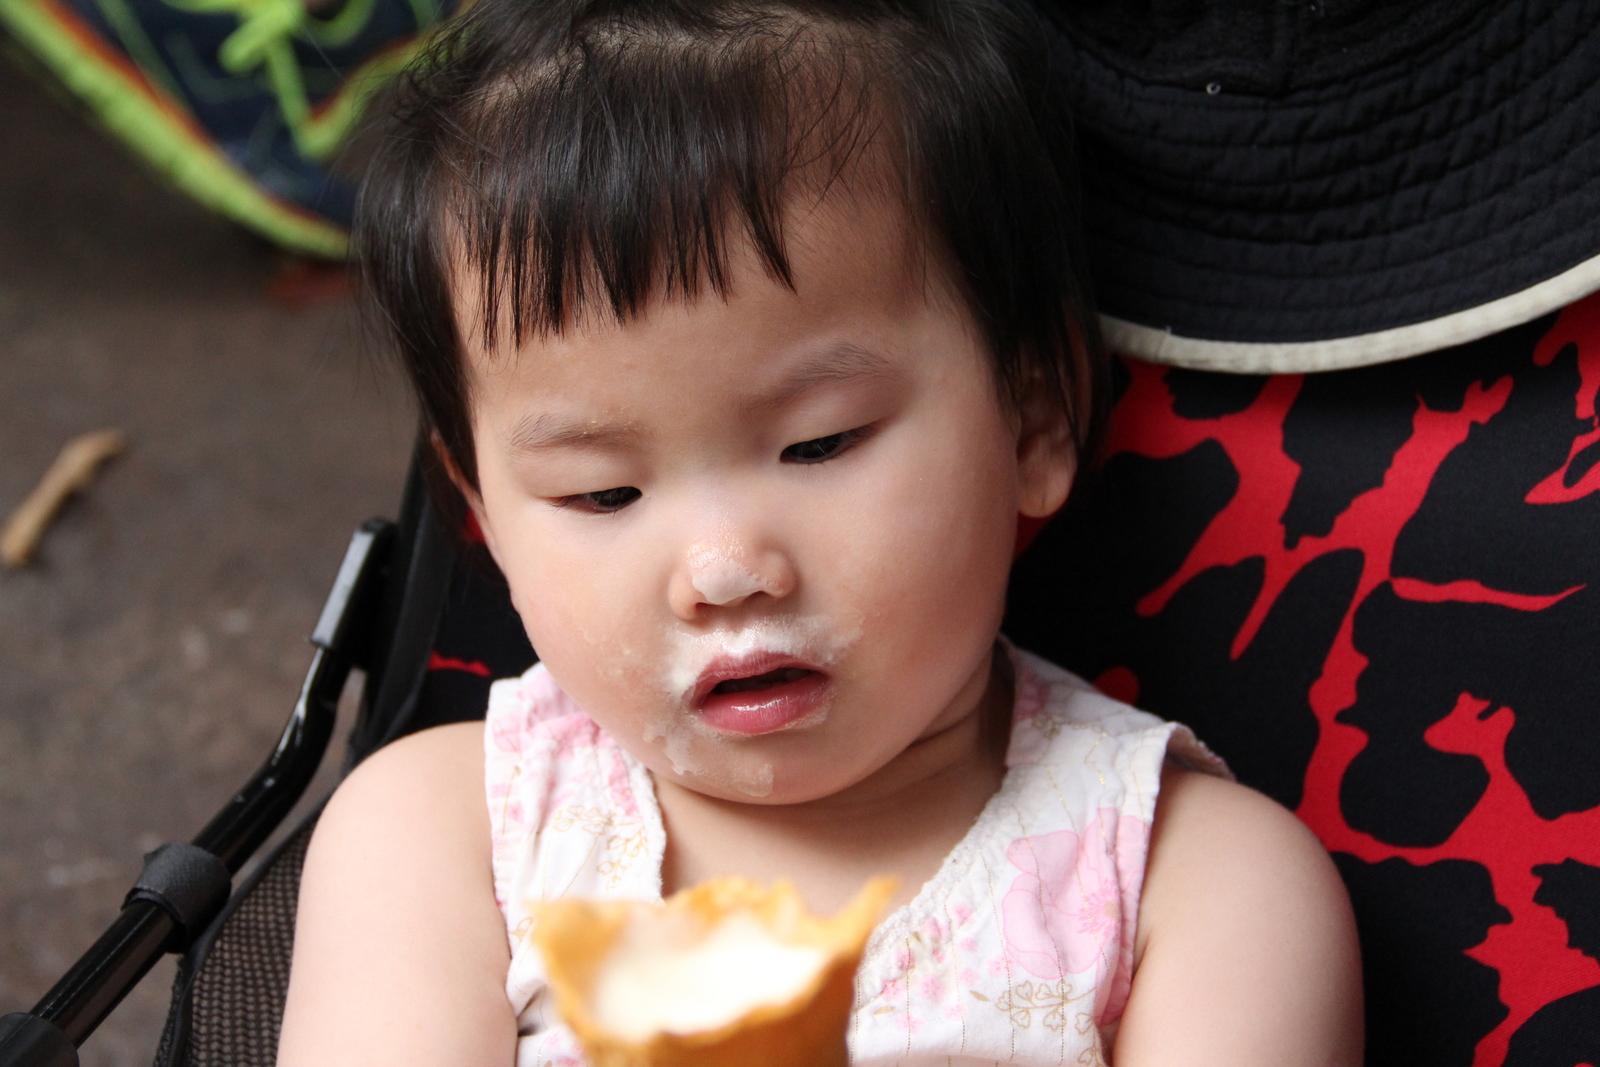 My girl loves ice cream!